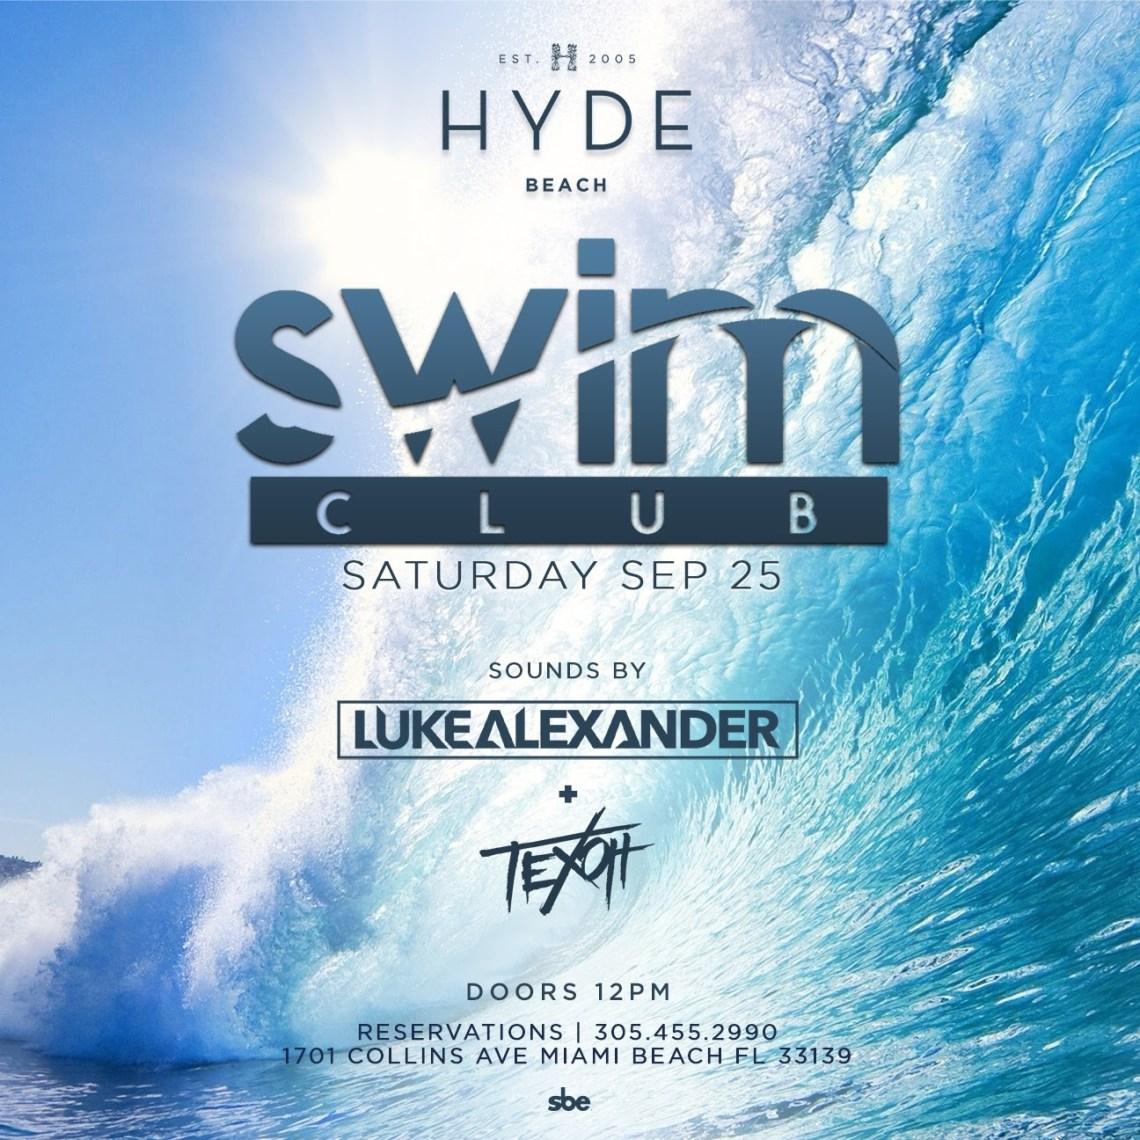 +++ Swim Club Saturday at SLS South Beach Hyde Beach - Luke Alexander & Texoh